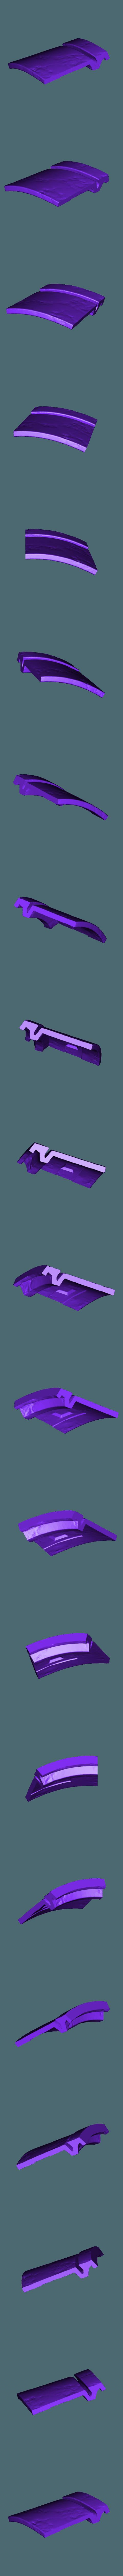 Armory_Damaged_Print5.stl Download OBJ file Armory - Knights of Ren Helmet (damaged), 3D print model • 3D print design, 3D-mon